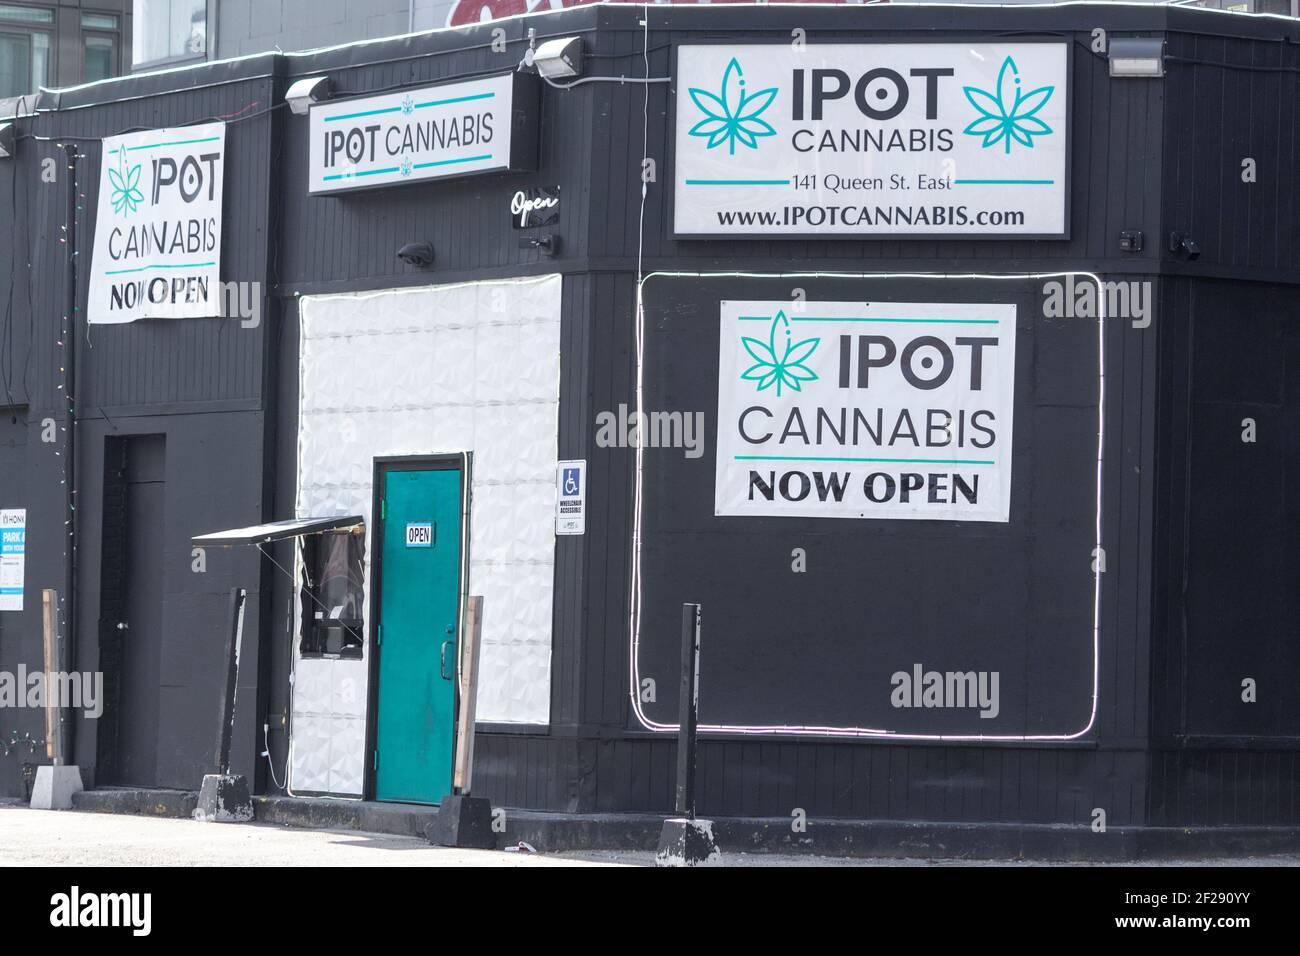 cannabis-marijuana-store-in-toronto-ontario-canada-2F290YY.jpg